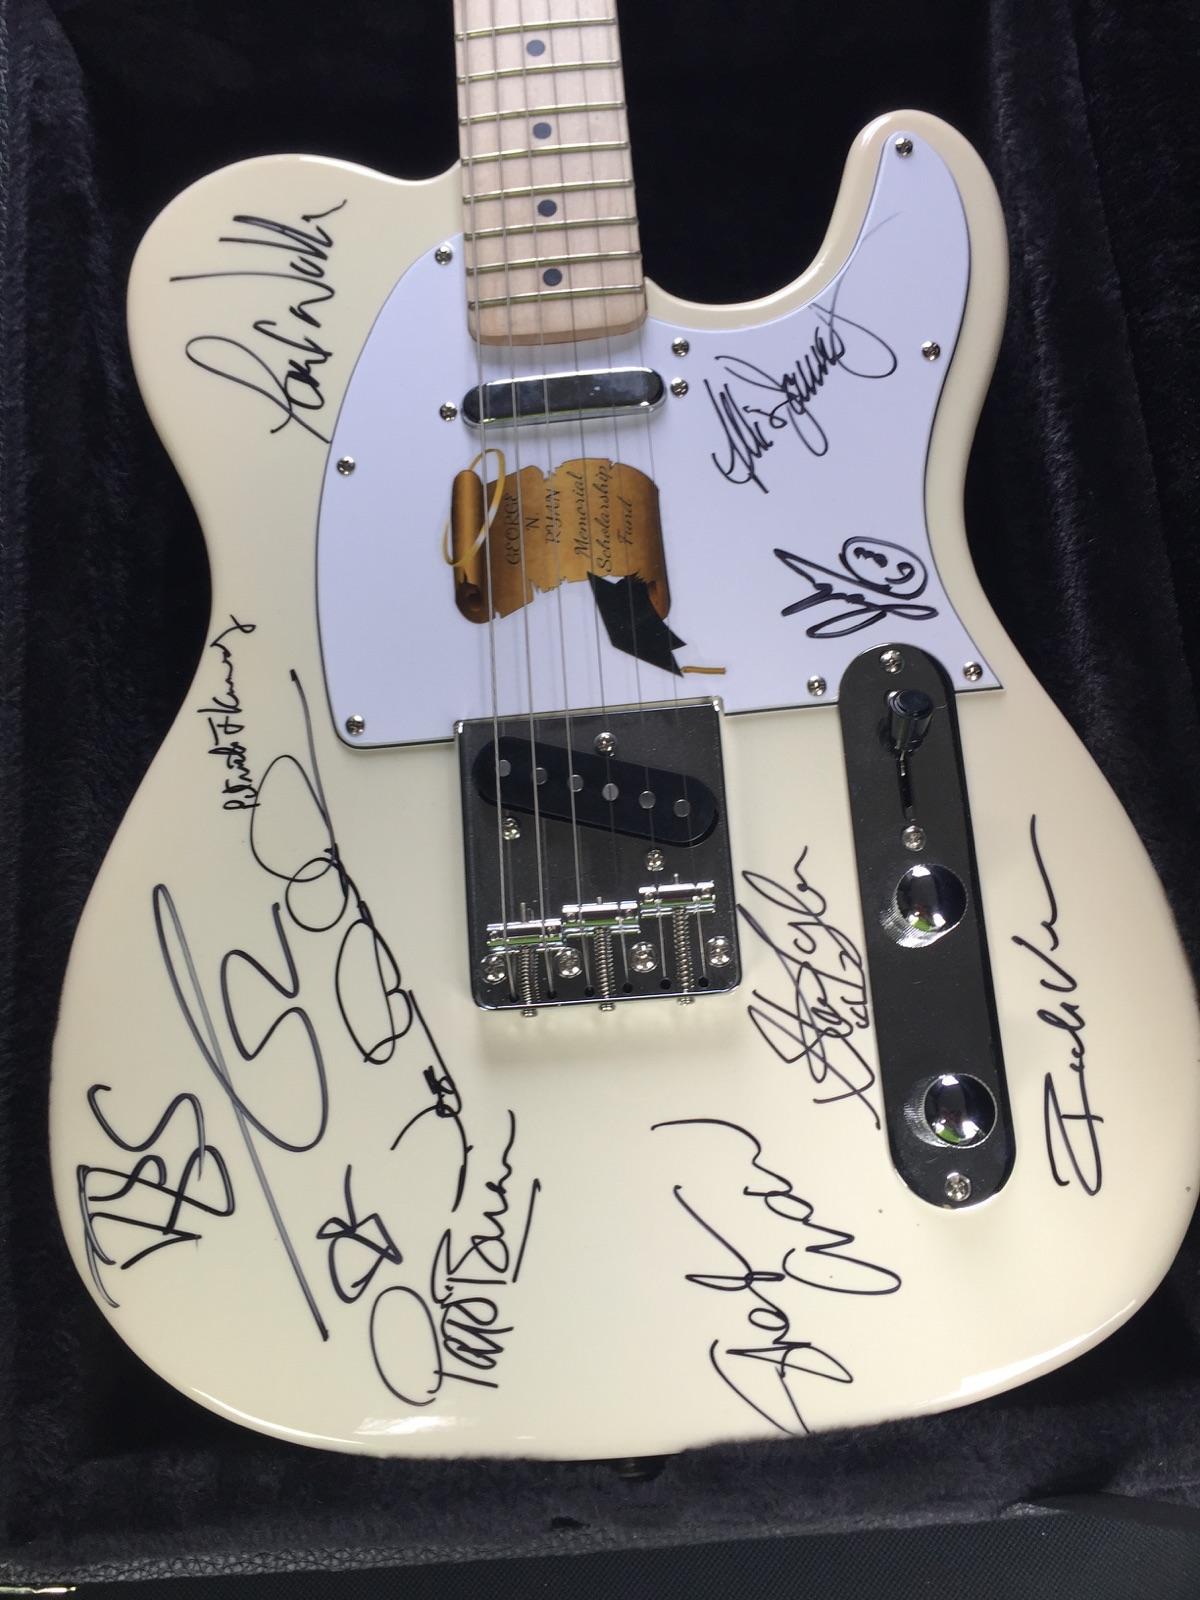 gnr guitar 2016.jpeg